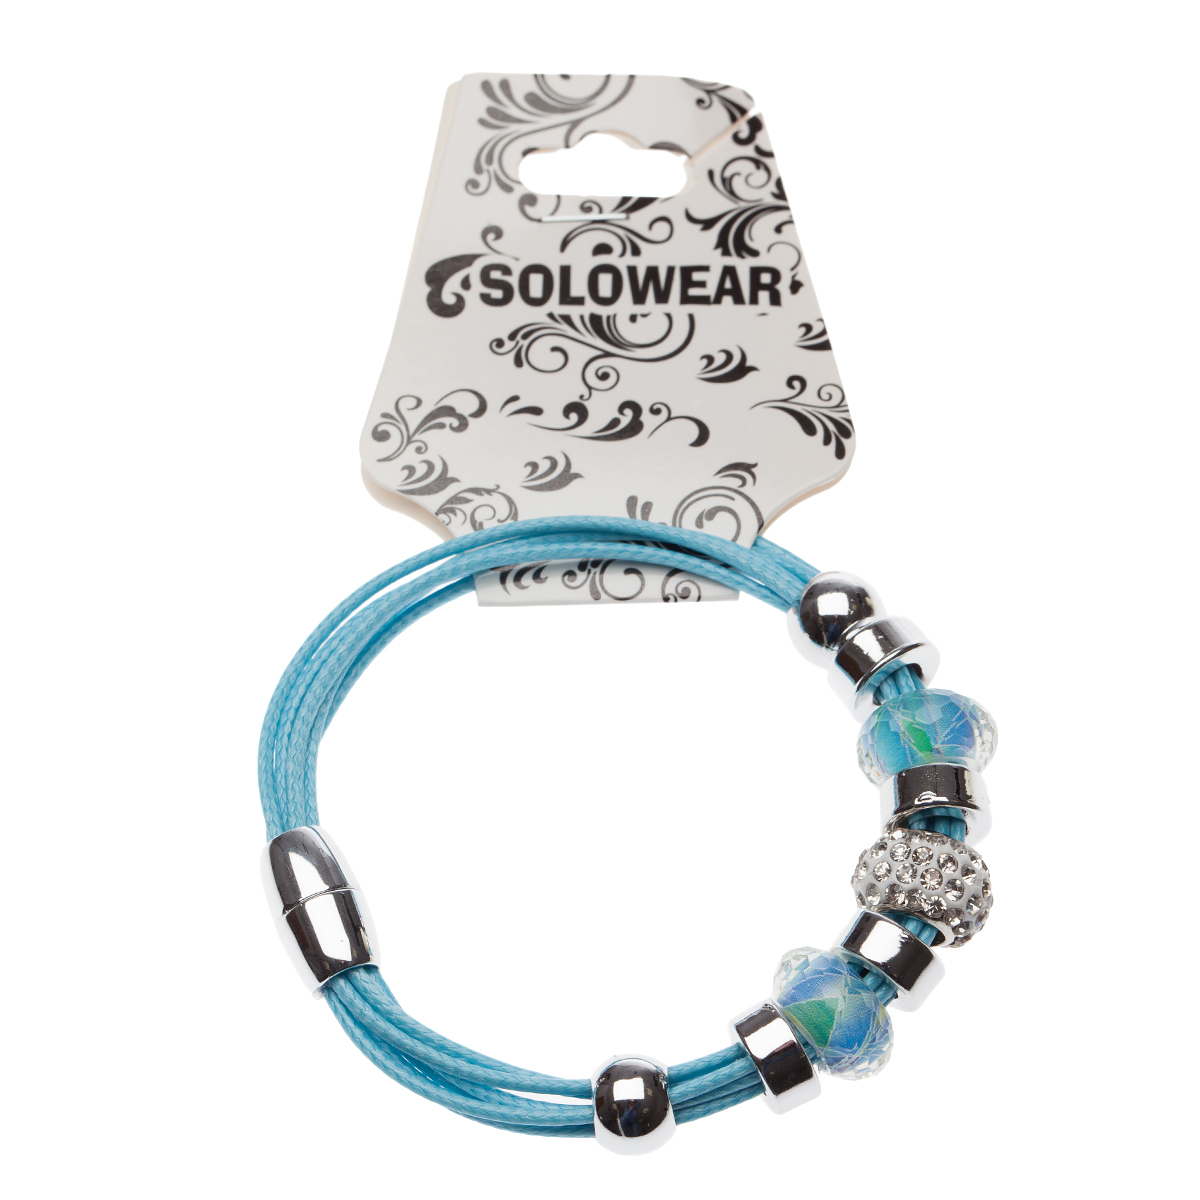 Браслет Solowear, 4620-2 браслет solowear 4620 7